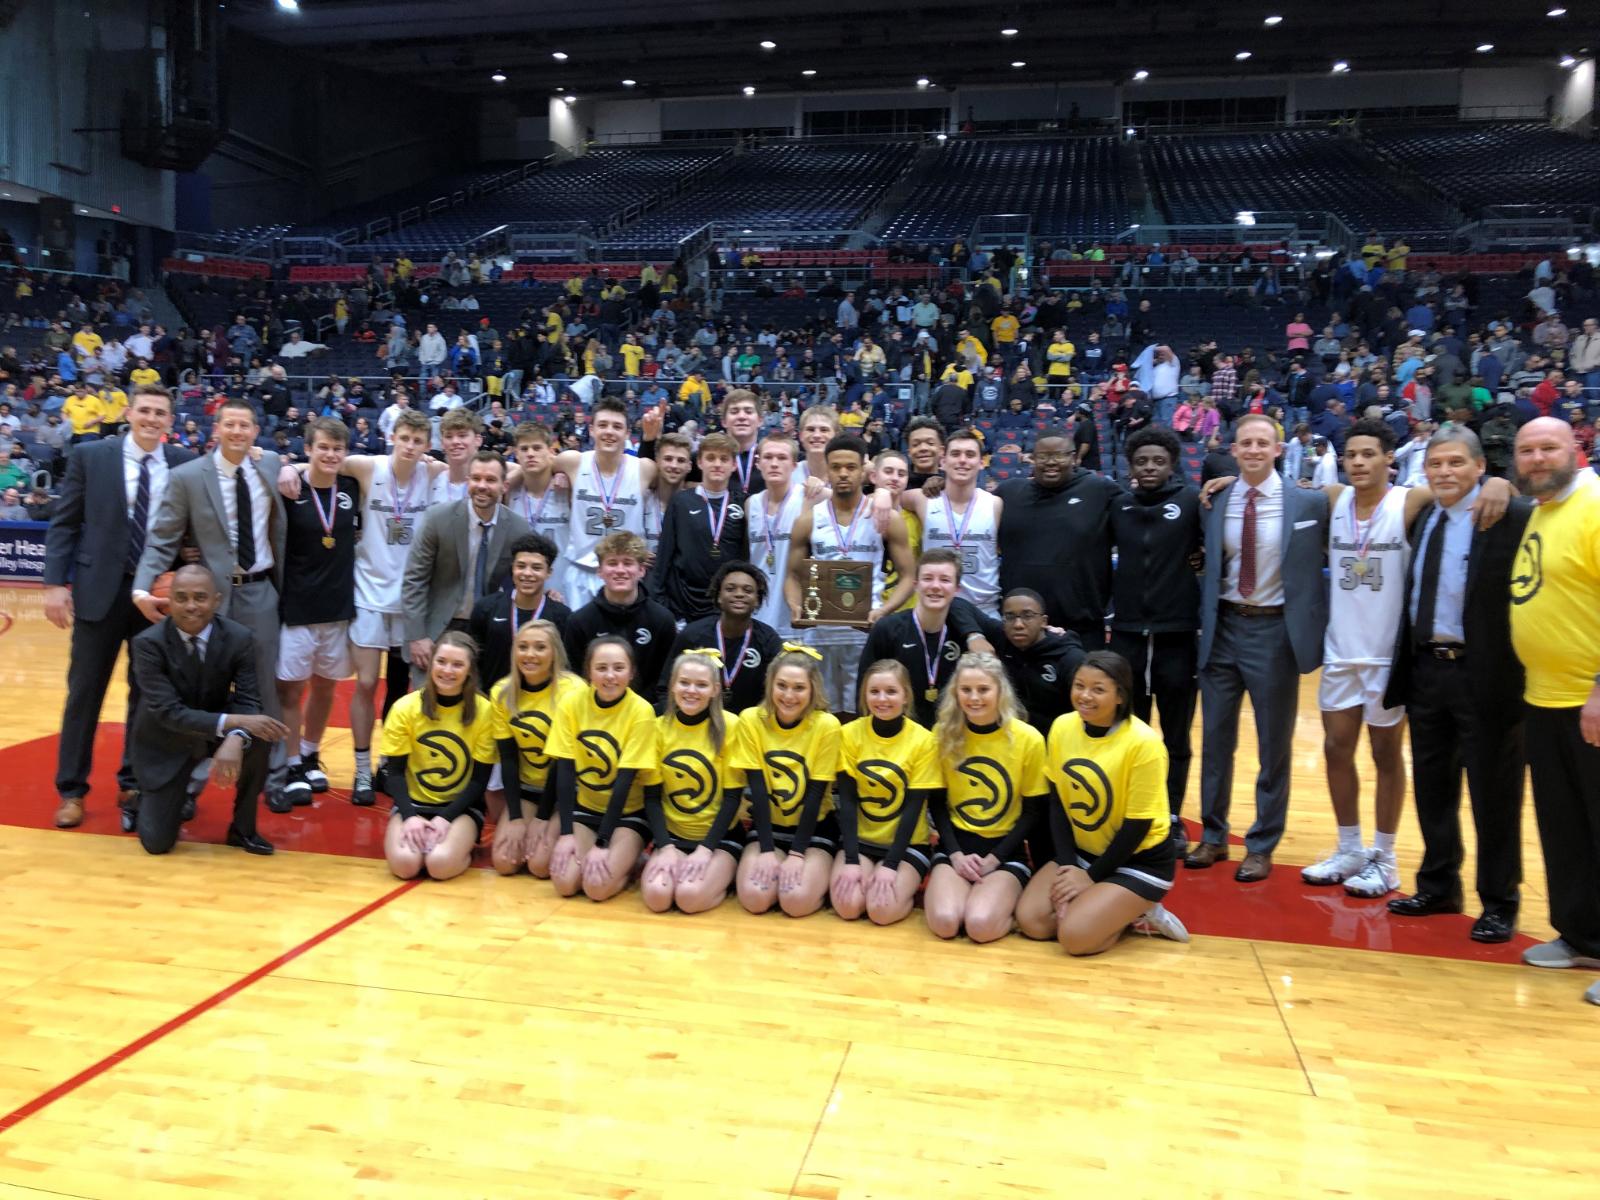 Boys Basketball District Champions Again!!